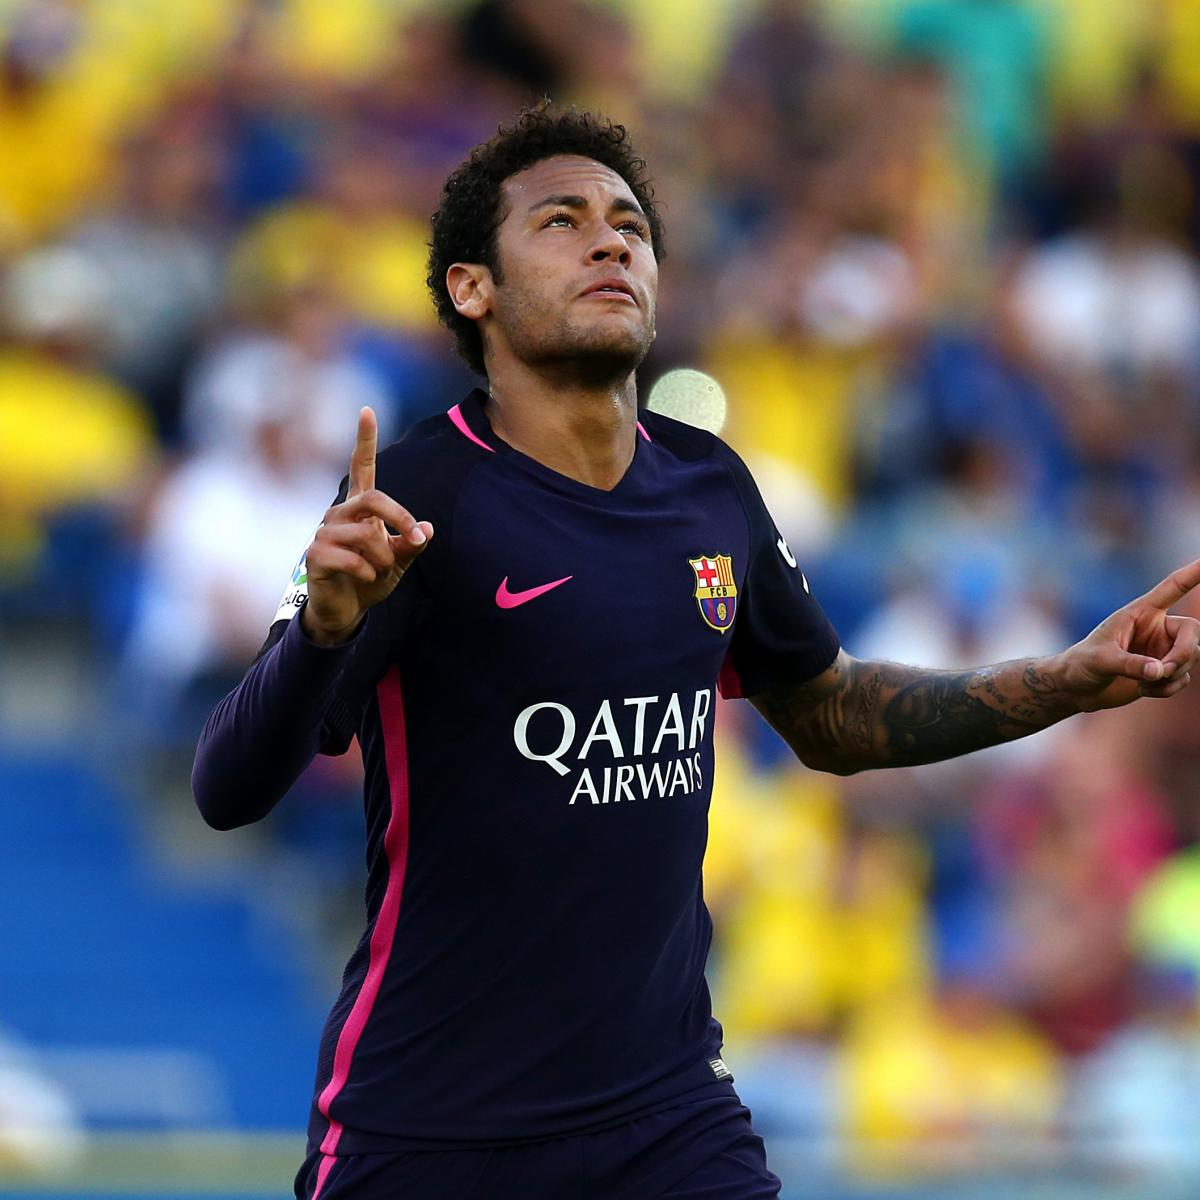 Celta Vigo Vs Barcelona Score Prediction: Barcelona Vs. Eibar: Team News, Preview, Live Stream And